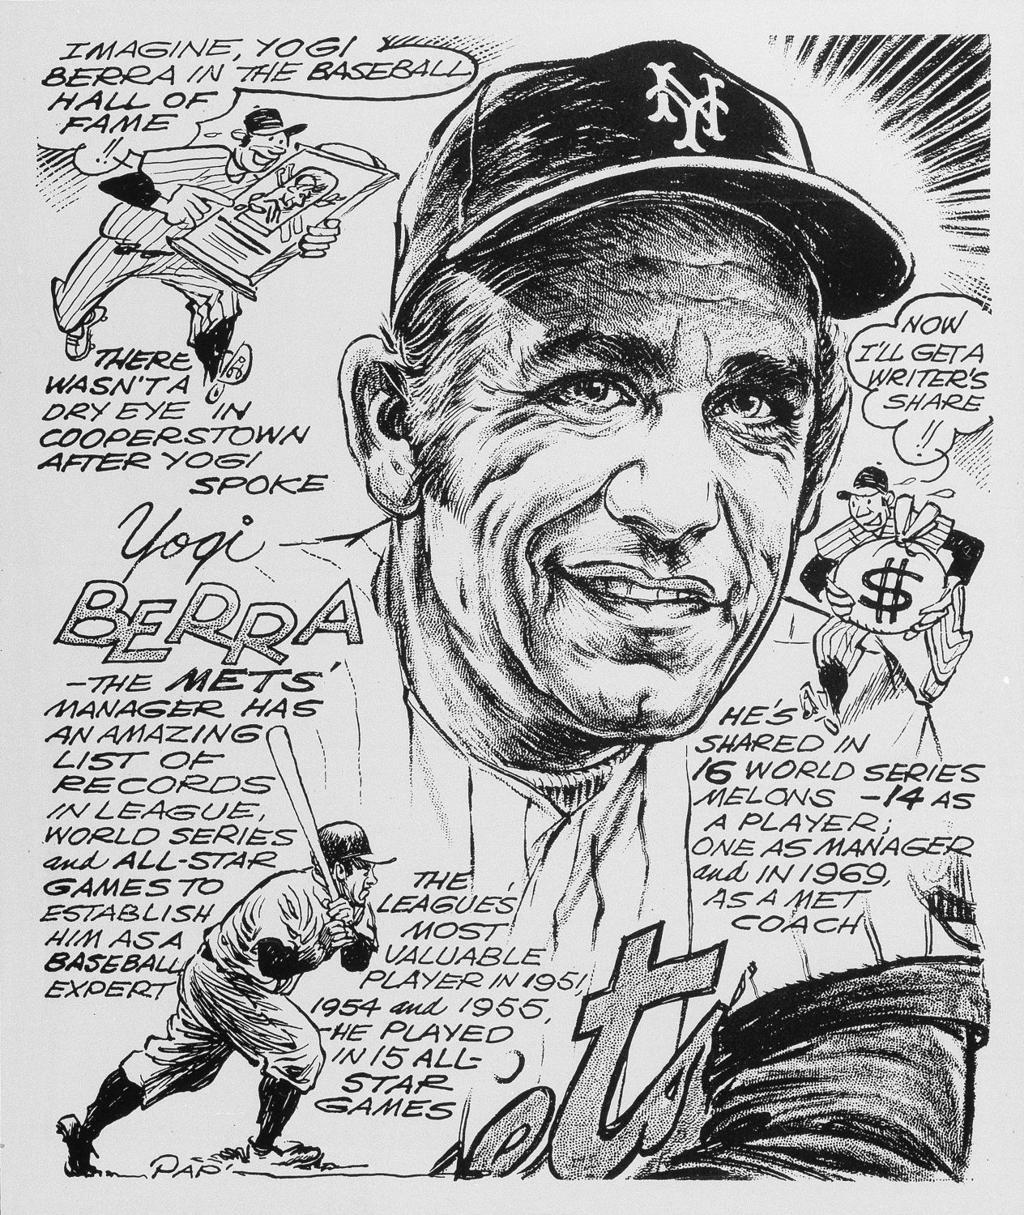 Gallery: Remembering Yogi Berra | Digital Exclusives: Photo